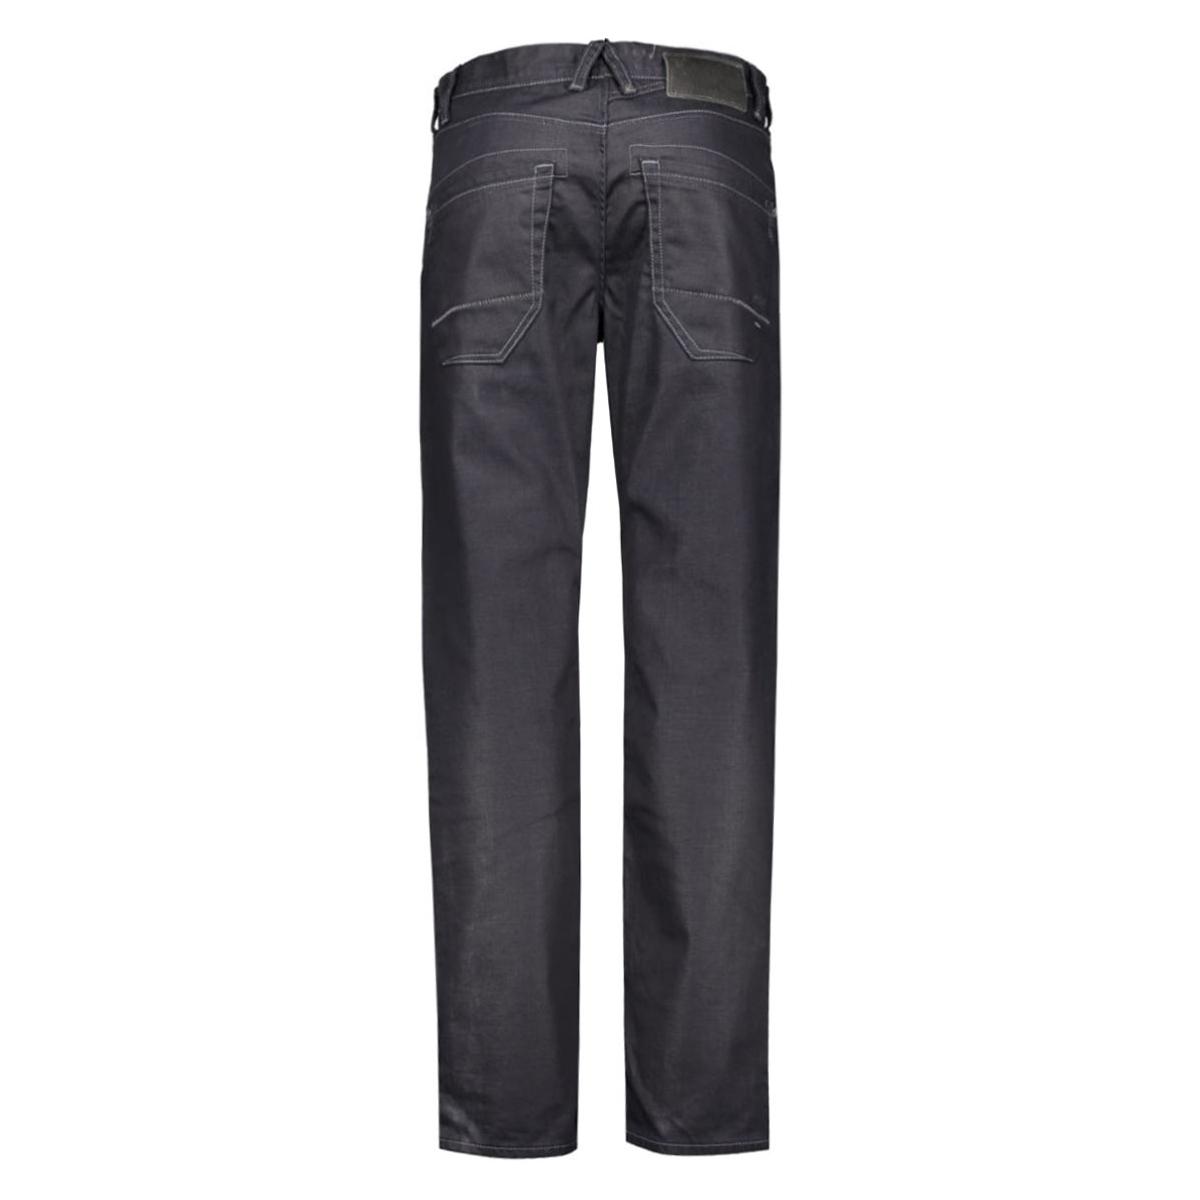 greyhound ptr190 pme legend jeans dct